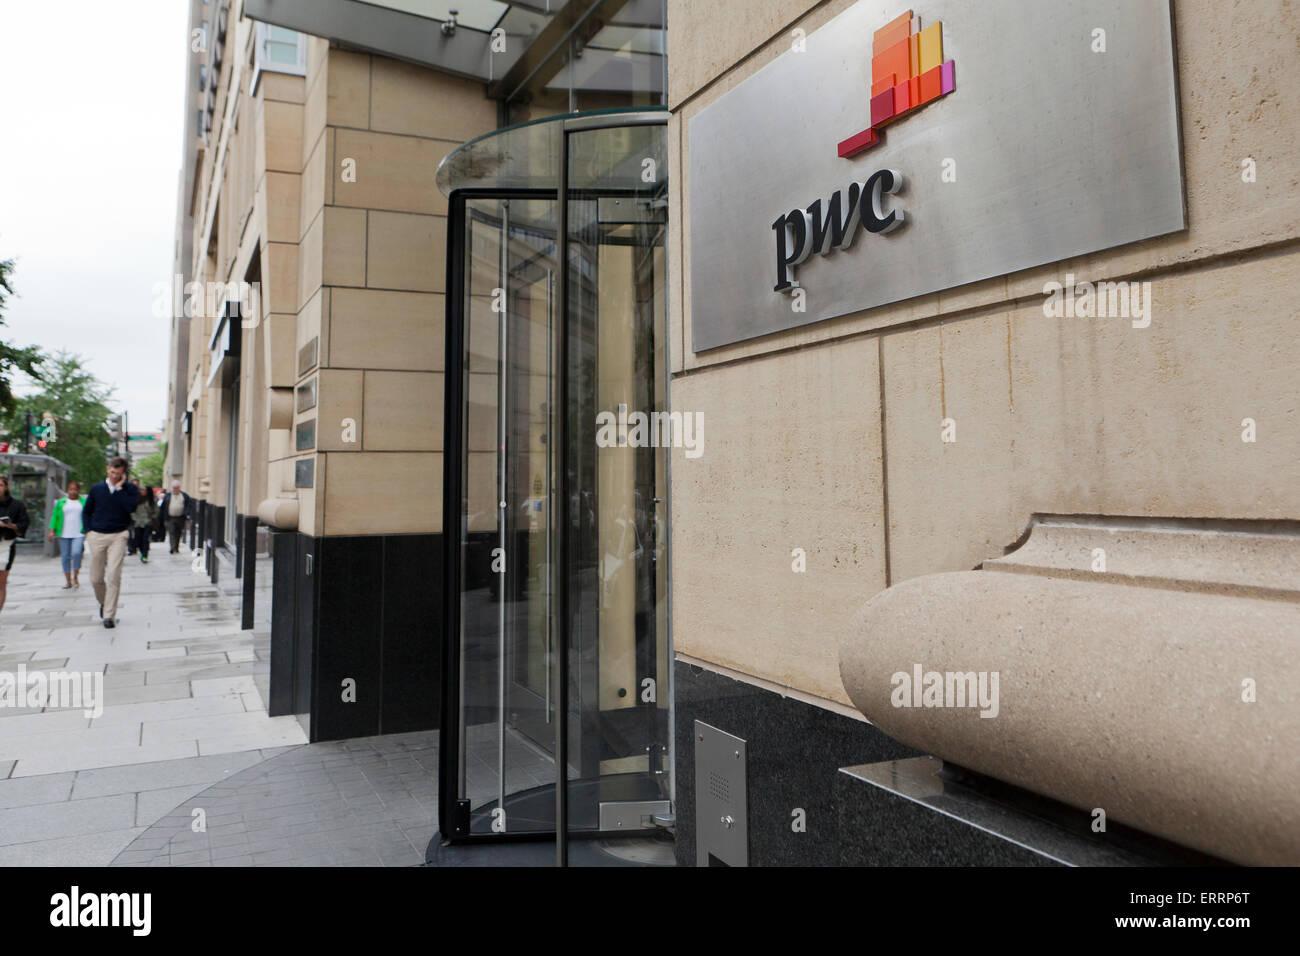 PWC (PricewaterhouseCoopers) office - Washington, DC USA - Stock Image